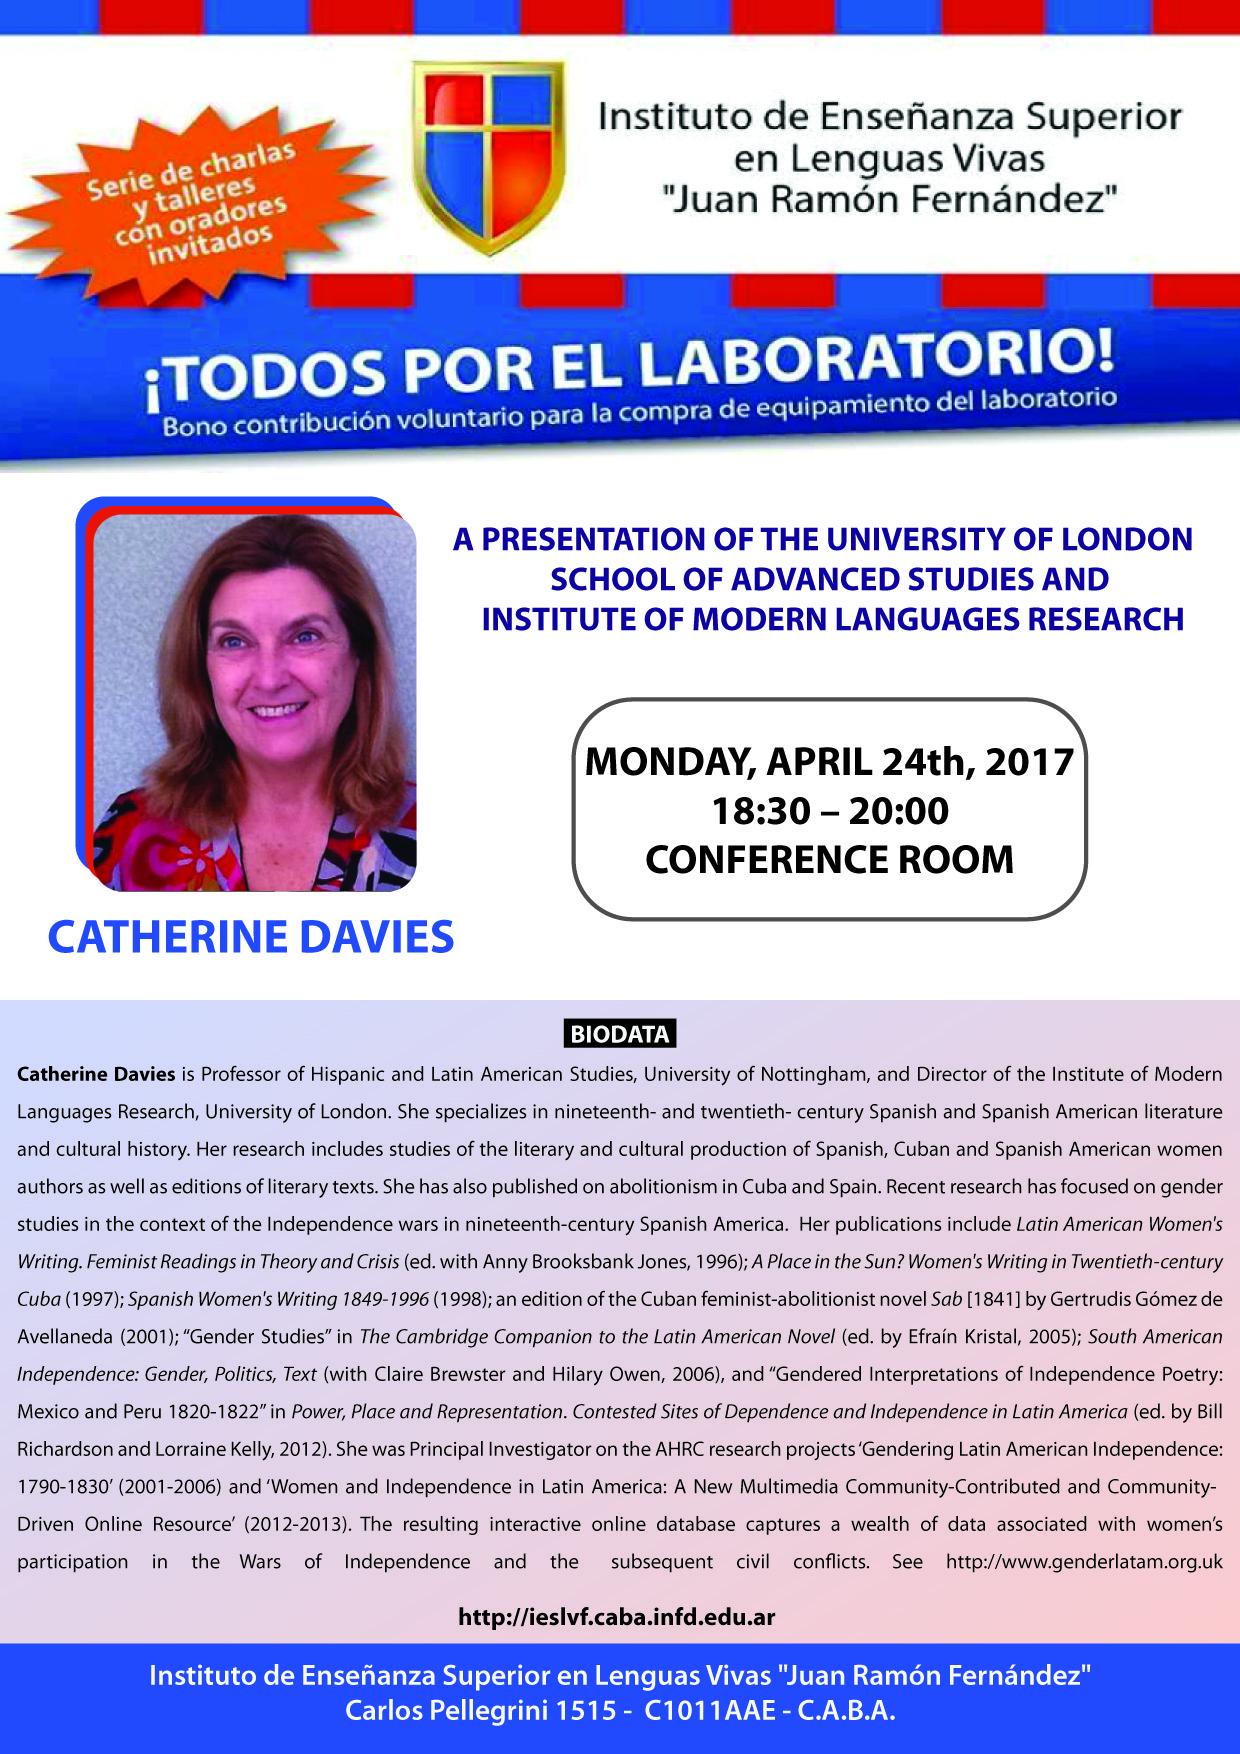 1. Catherine Davies_24 de abril_salon de conferencias